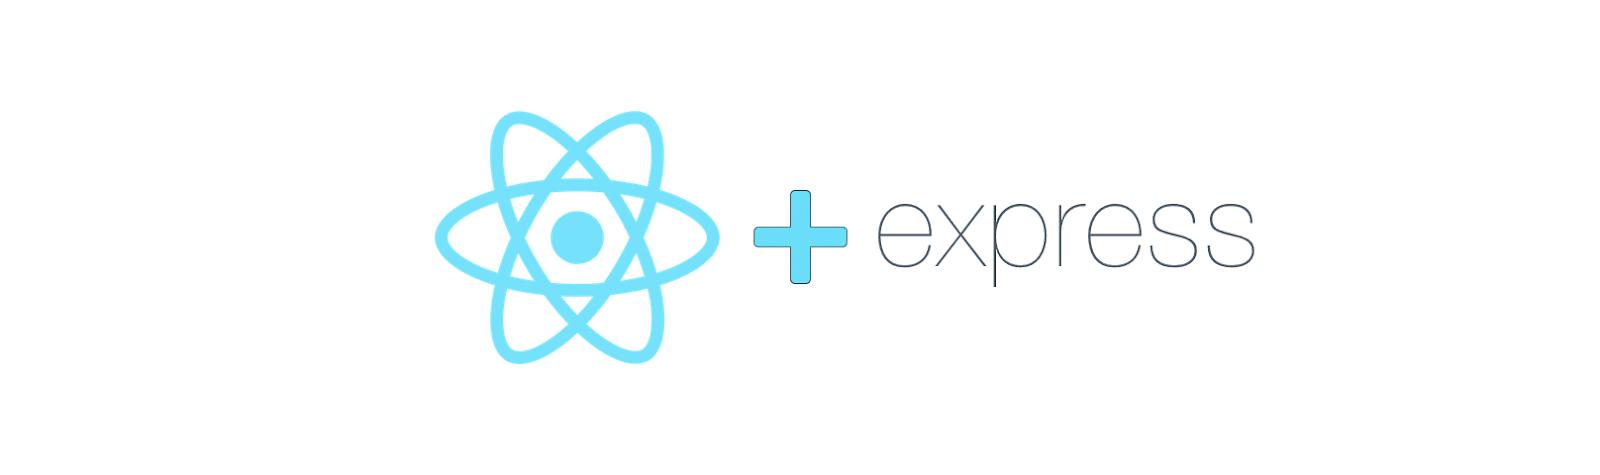 Set up a React app with a Node js server proxy - Twilio